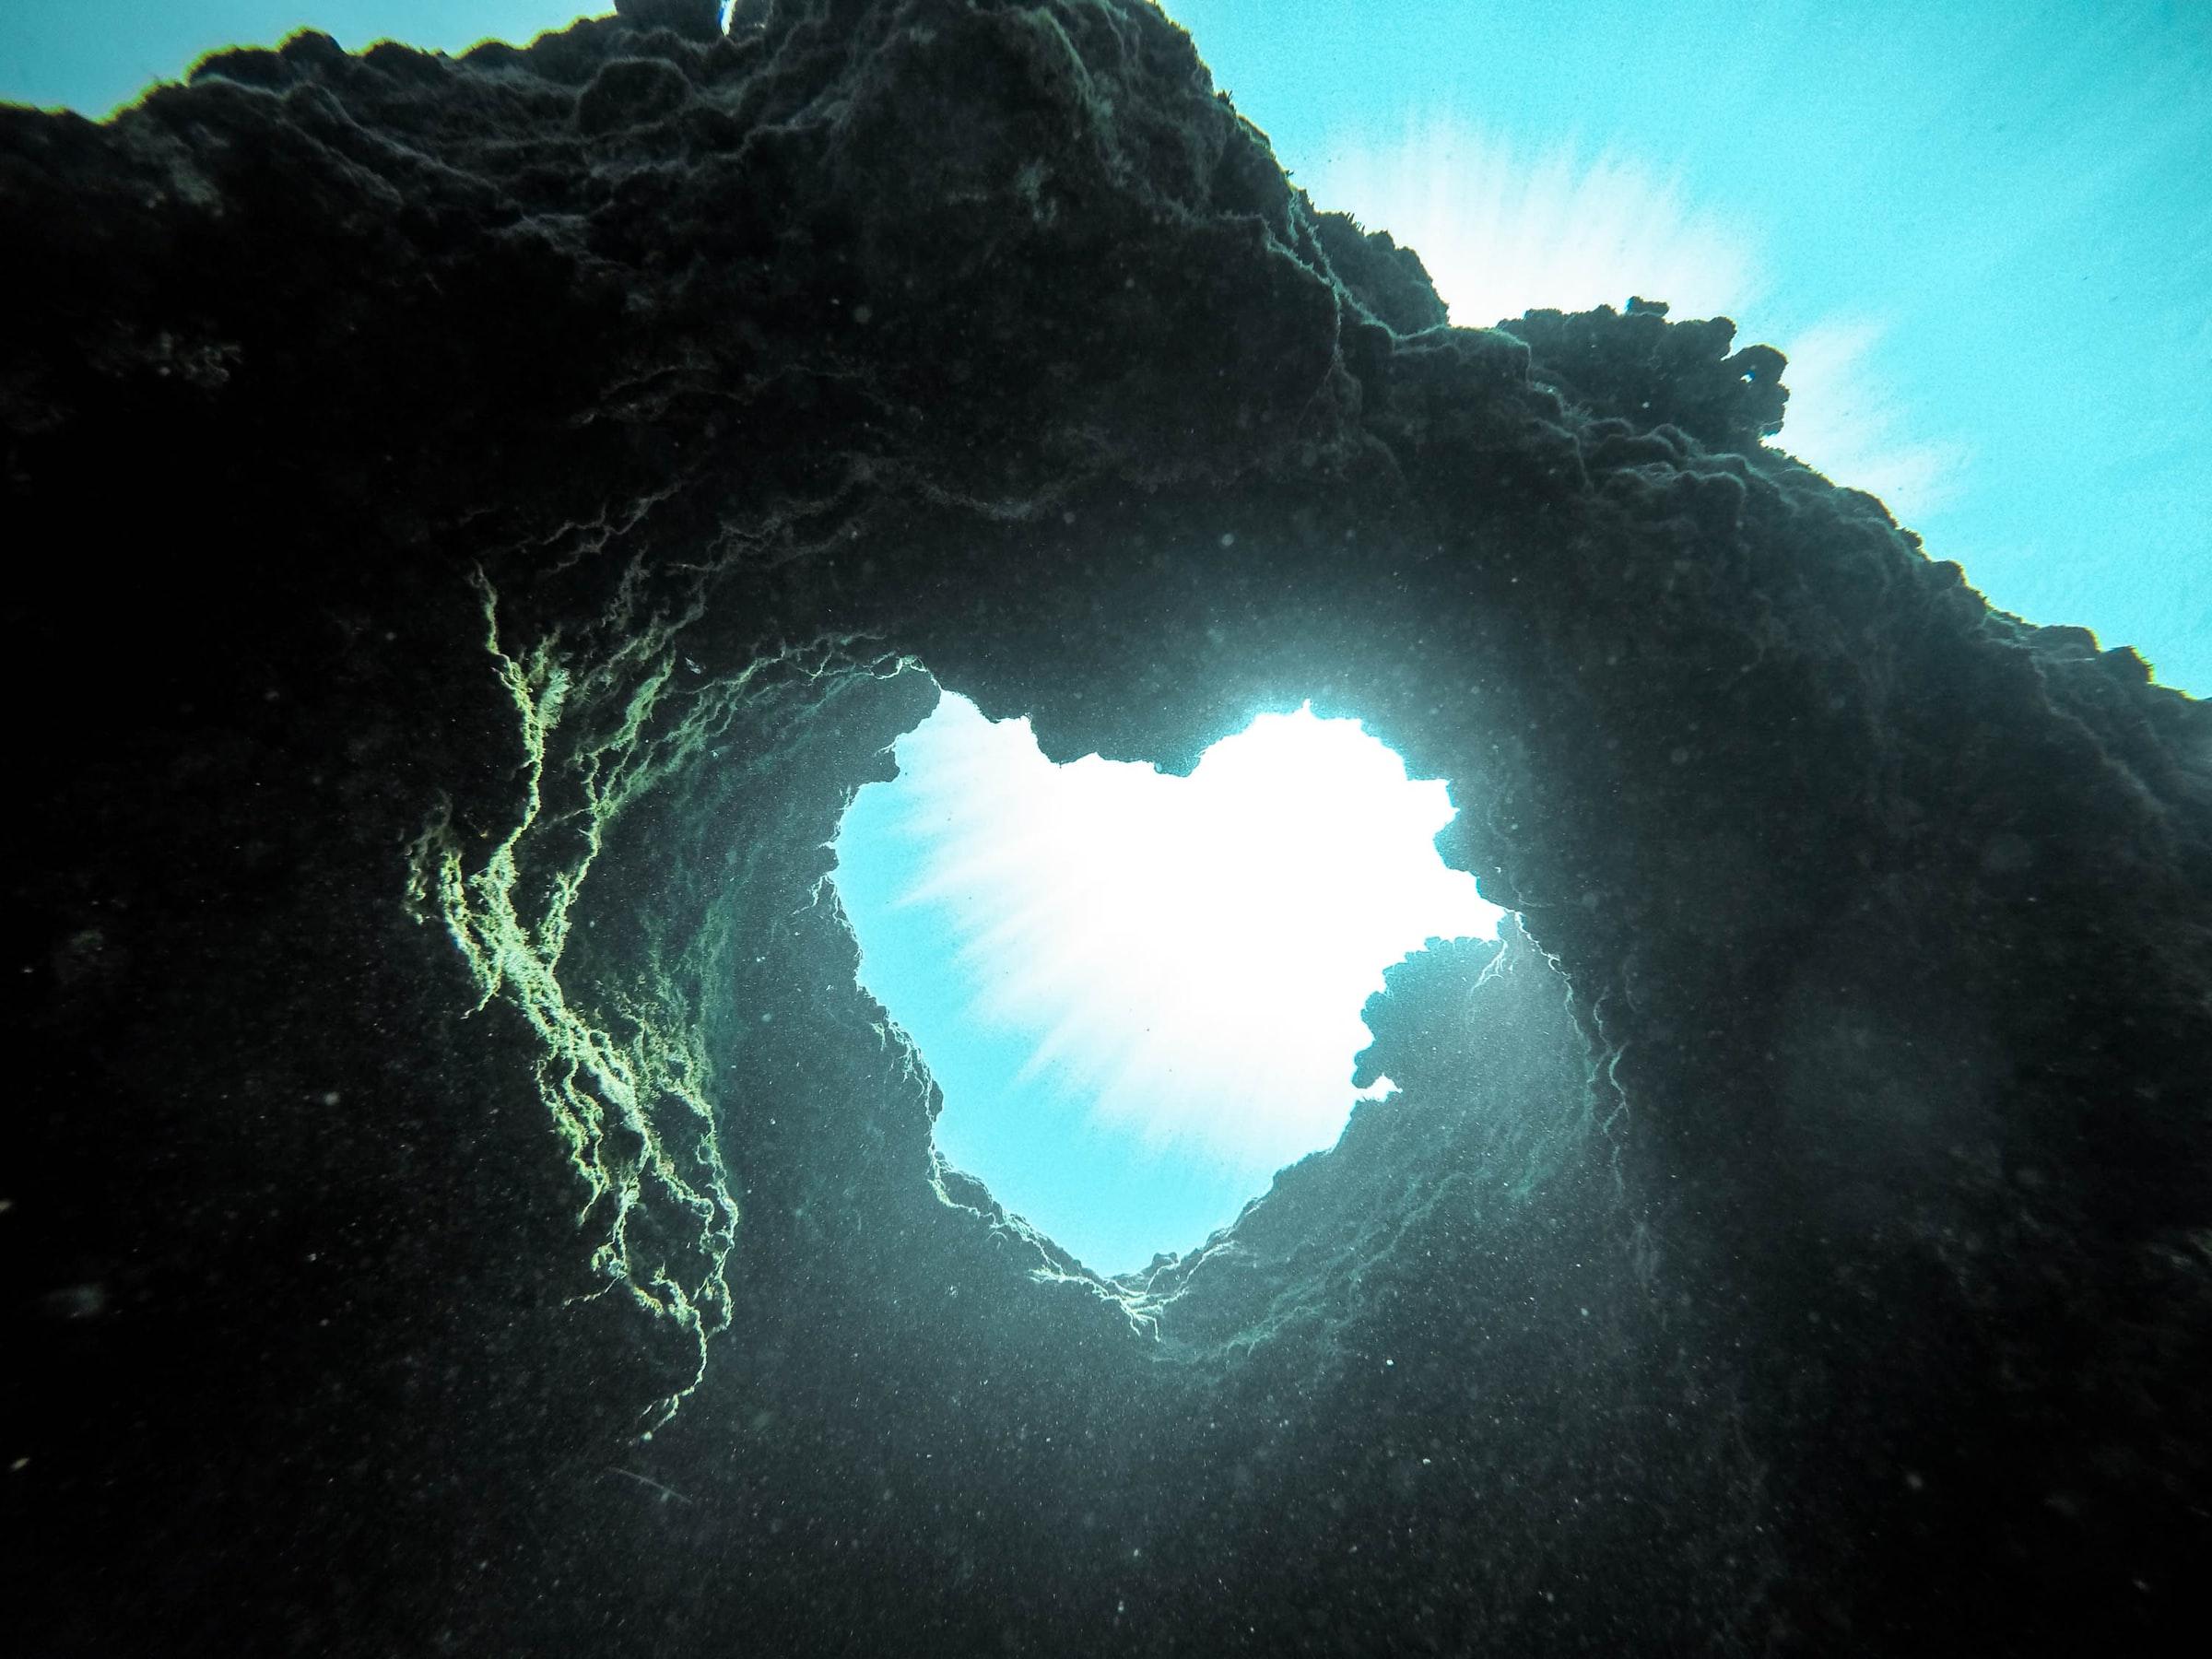 Beneath the waterline